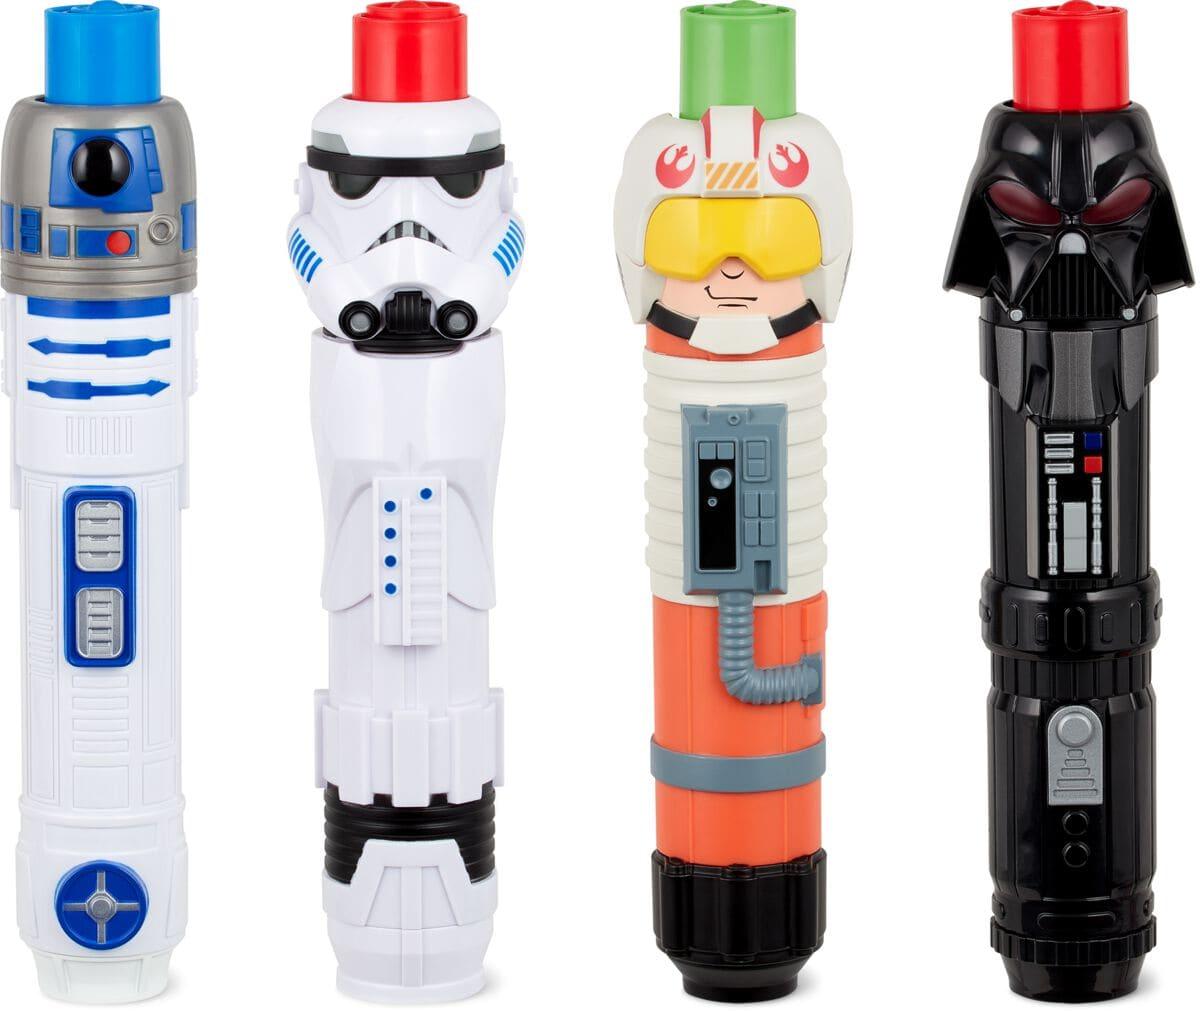 Star Wars Lightsaber Academy Level 1 Rollenspiel